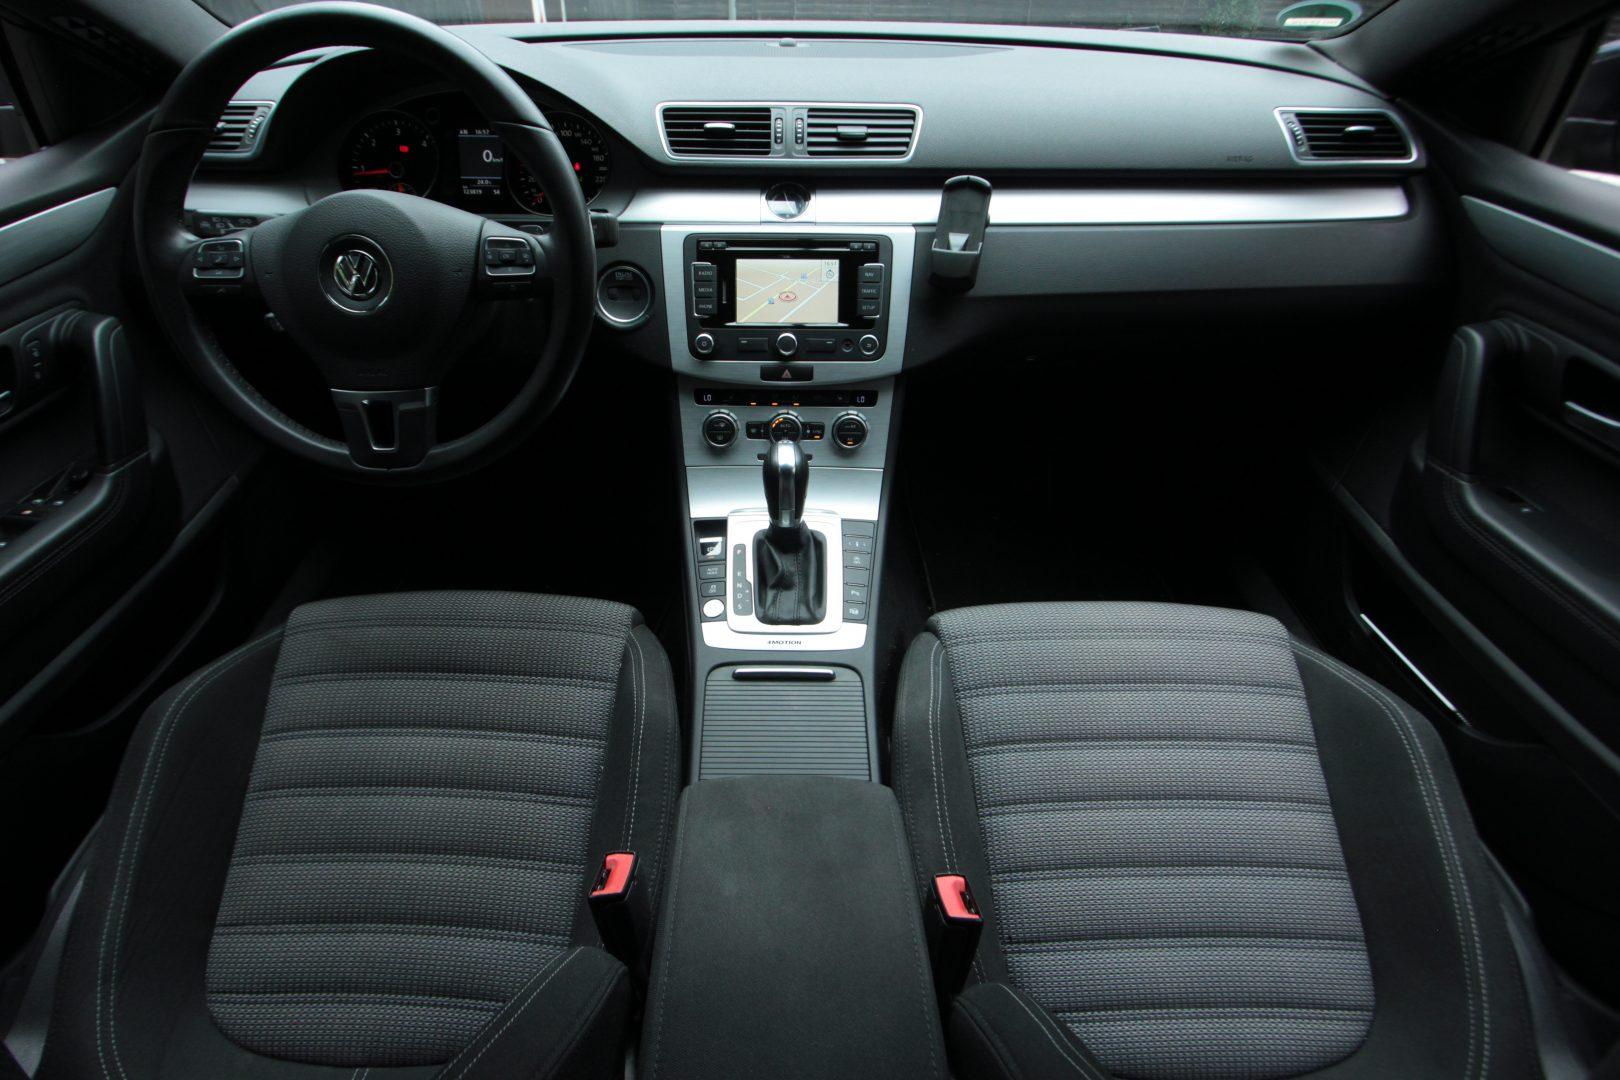 AIL VW CC 2.0TDI Basis BMT 4Motion DSG 6